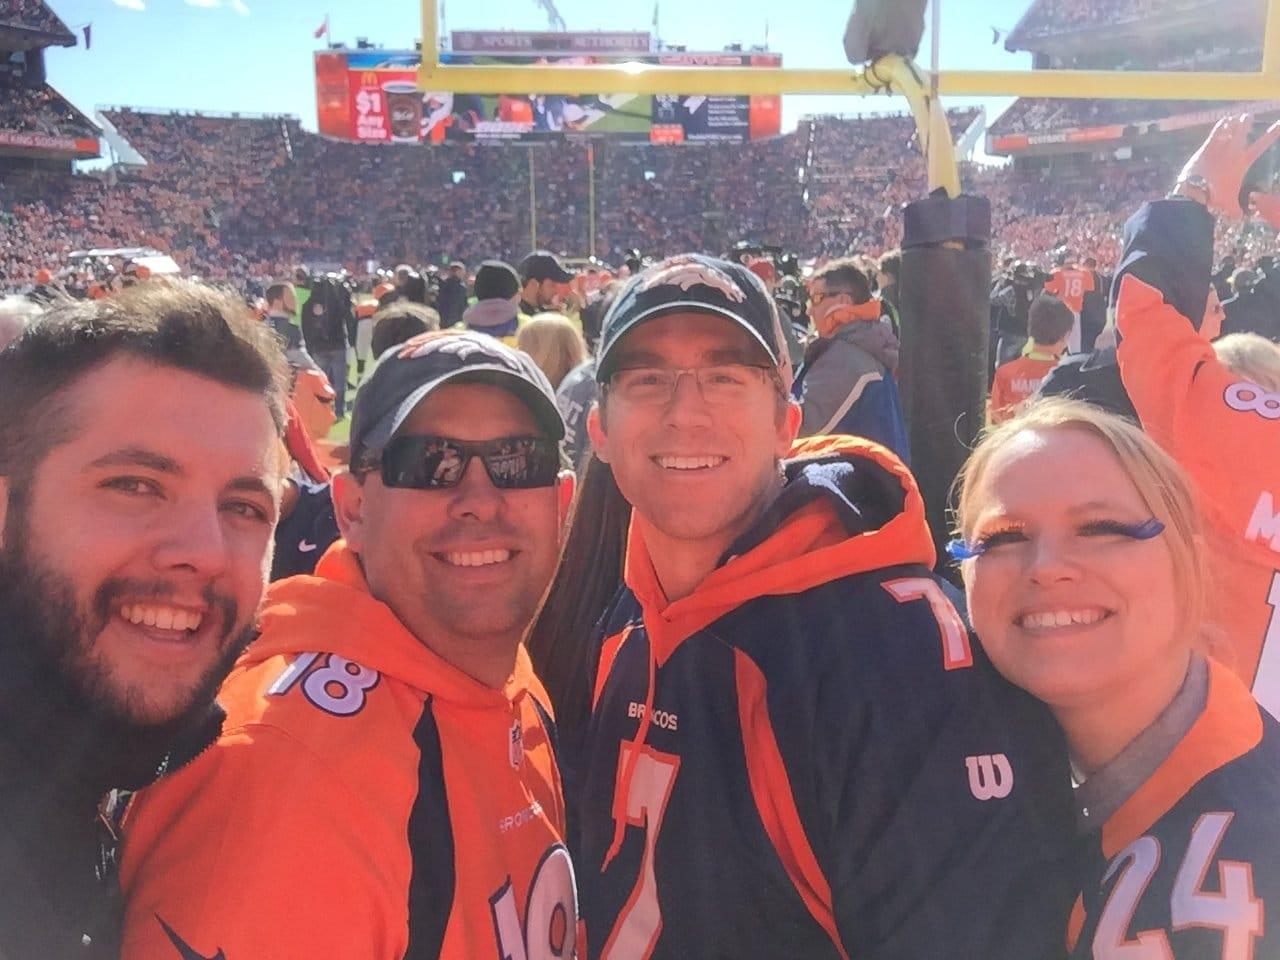 AFC Championship Broncos Patriots 2017